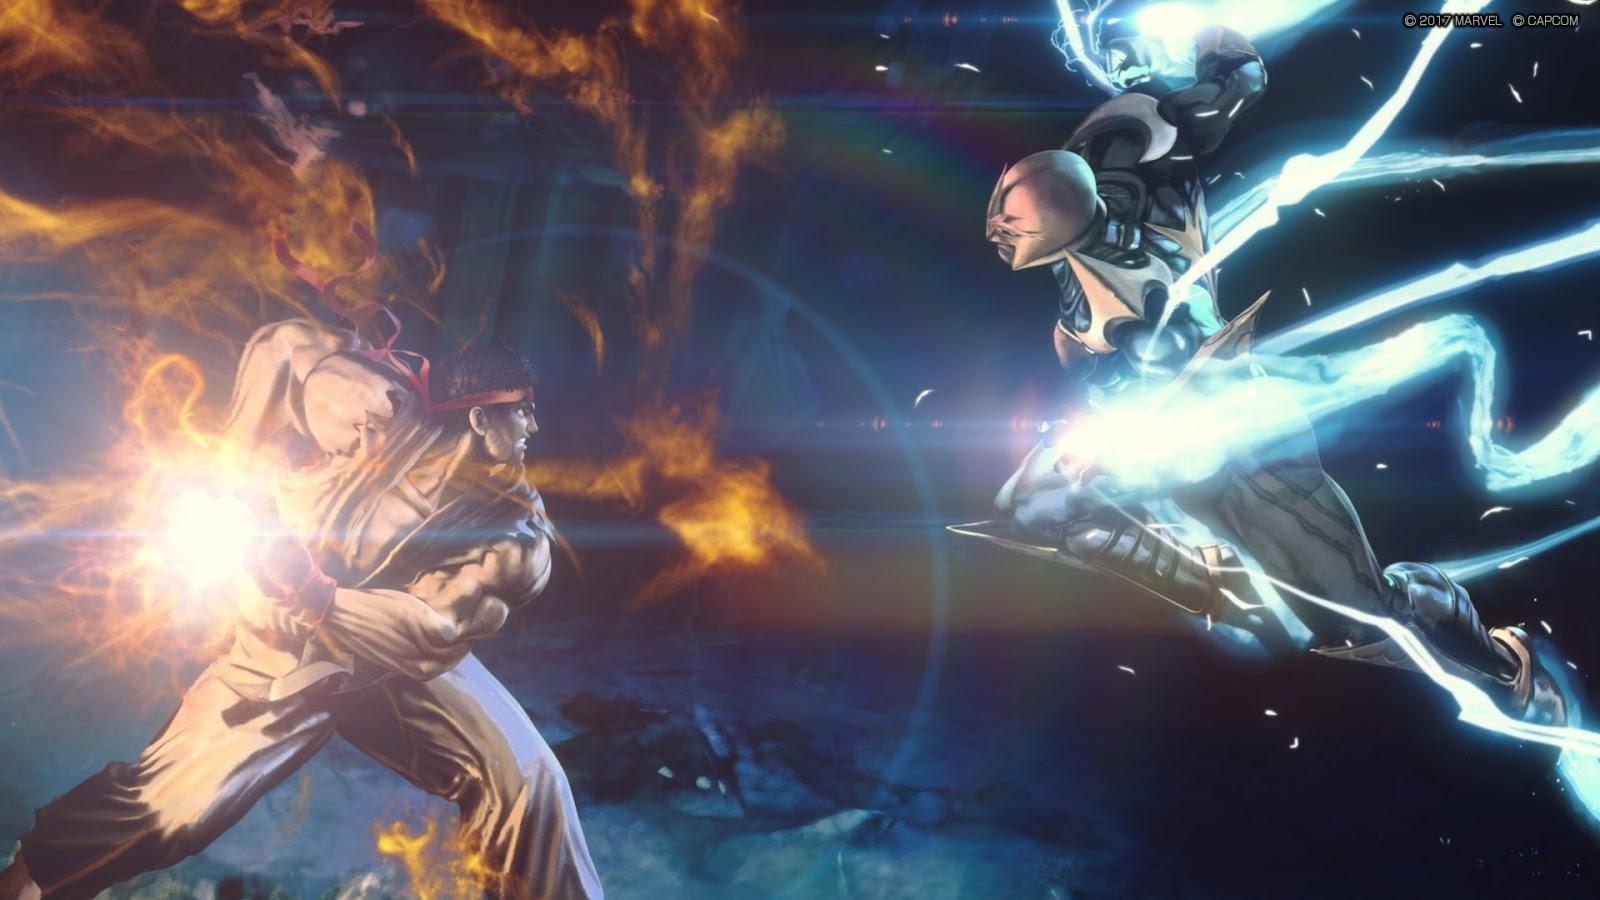 Ultimate Marvel vs Capcom 3 ESPAÑOL PC Descargar Full (CODEX) 3